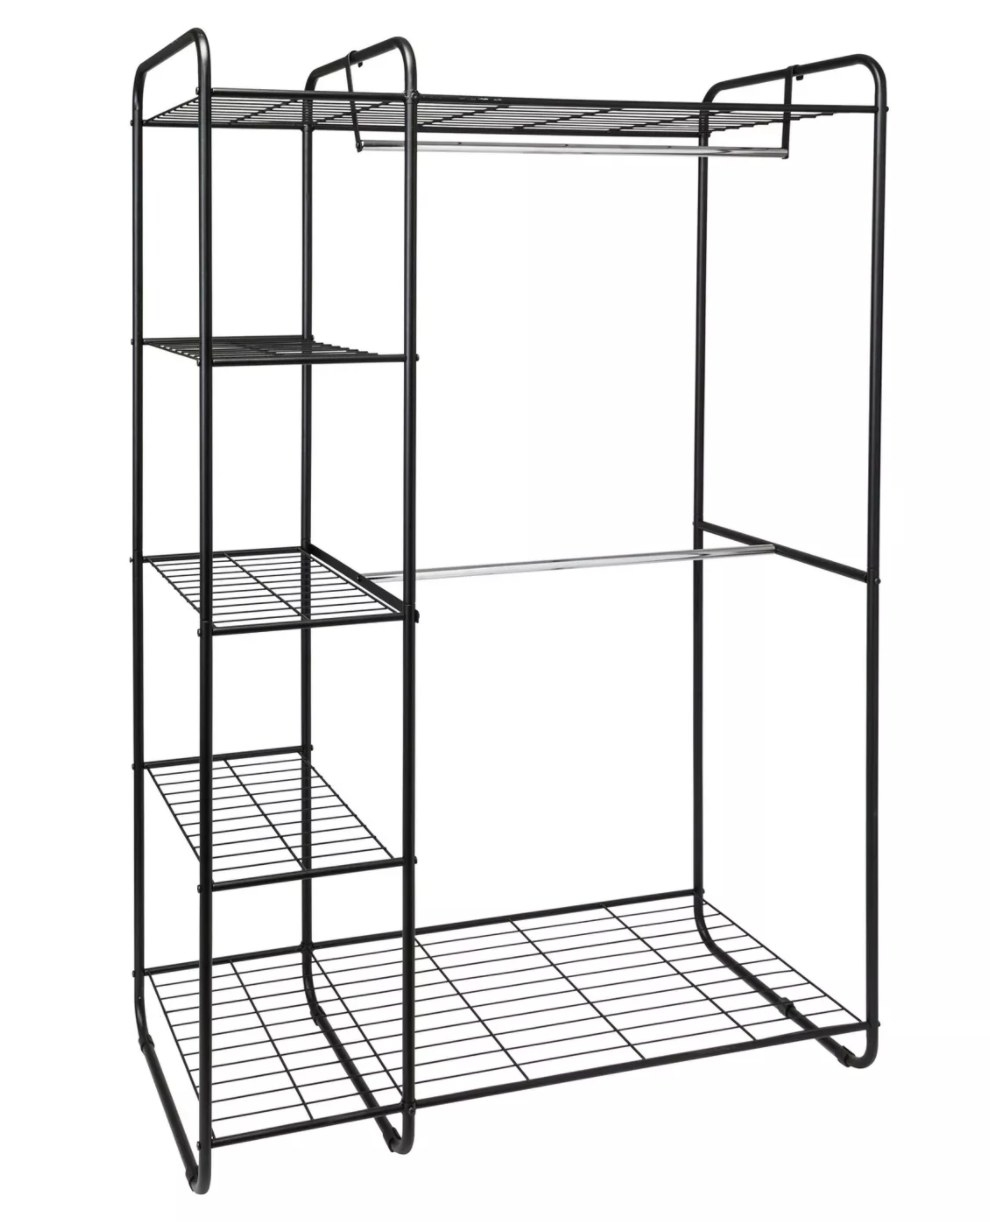 A black freestanding metal garment rack